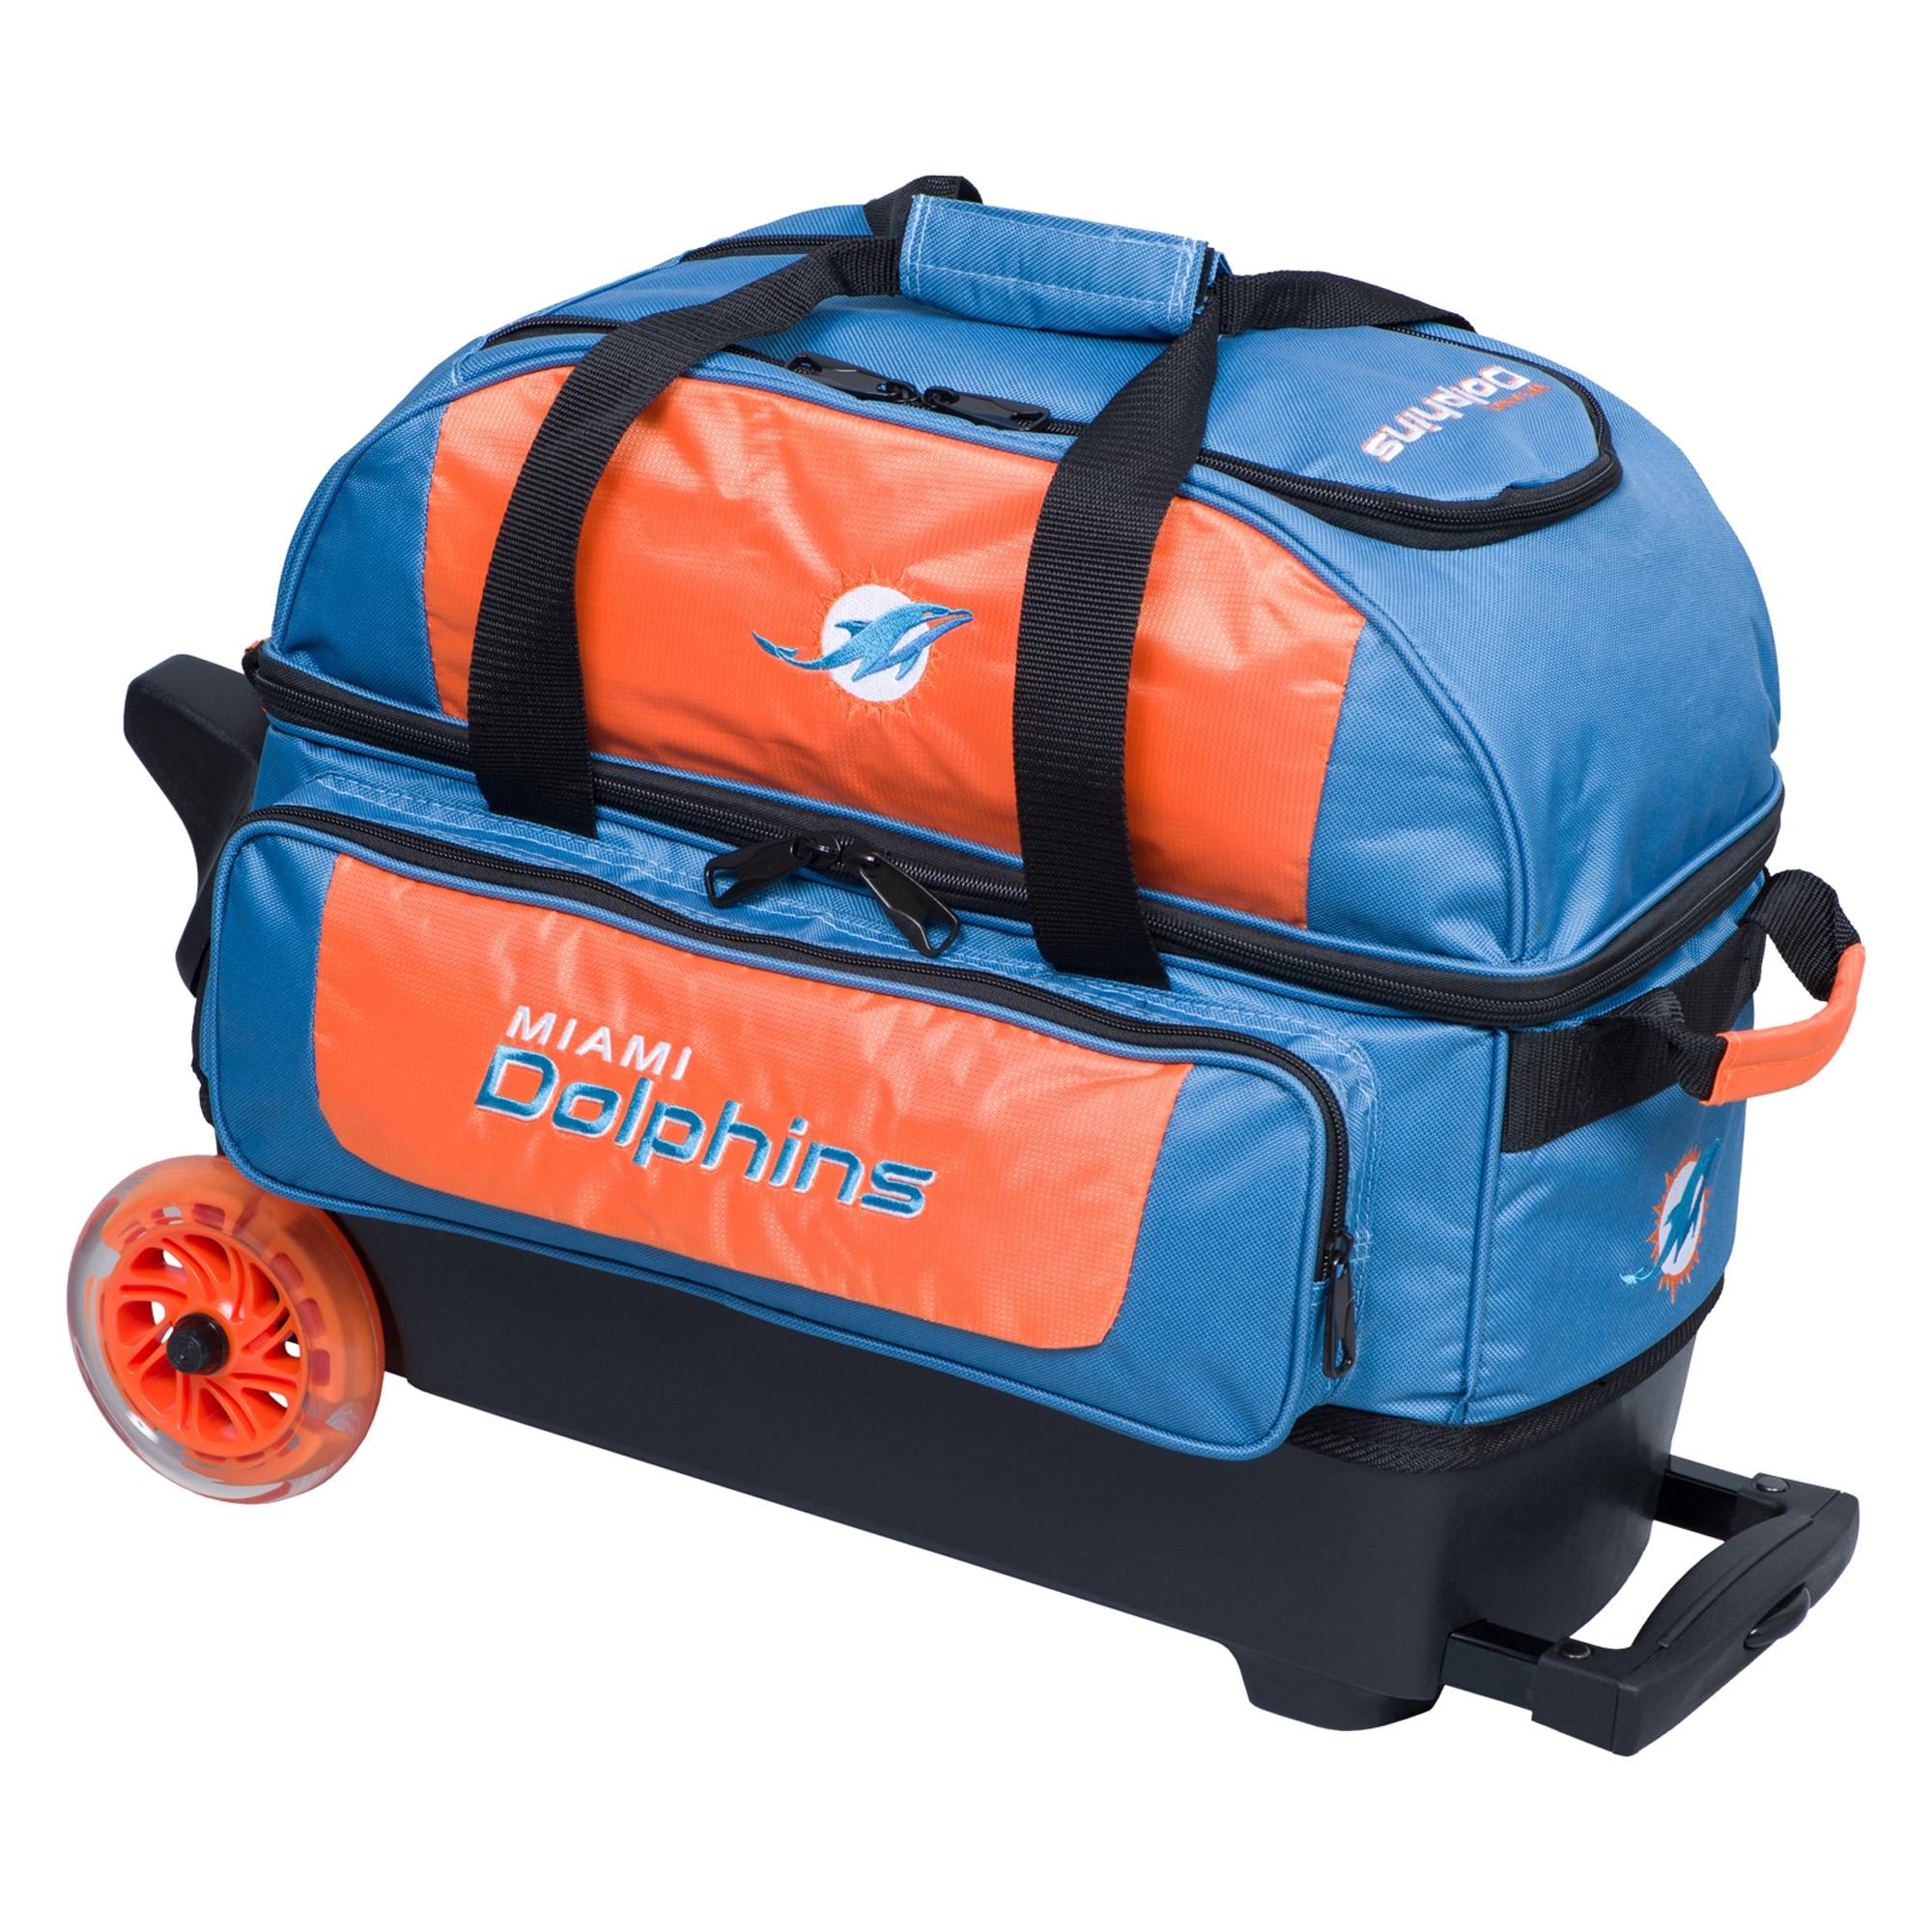 Miami Dolphins Two-Ball Roller Bowling Bag - Aqua